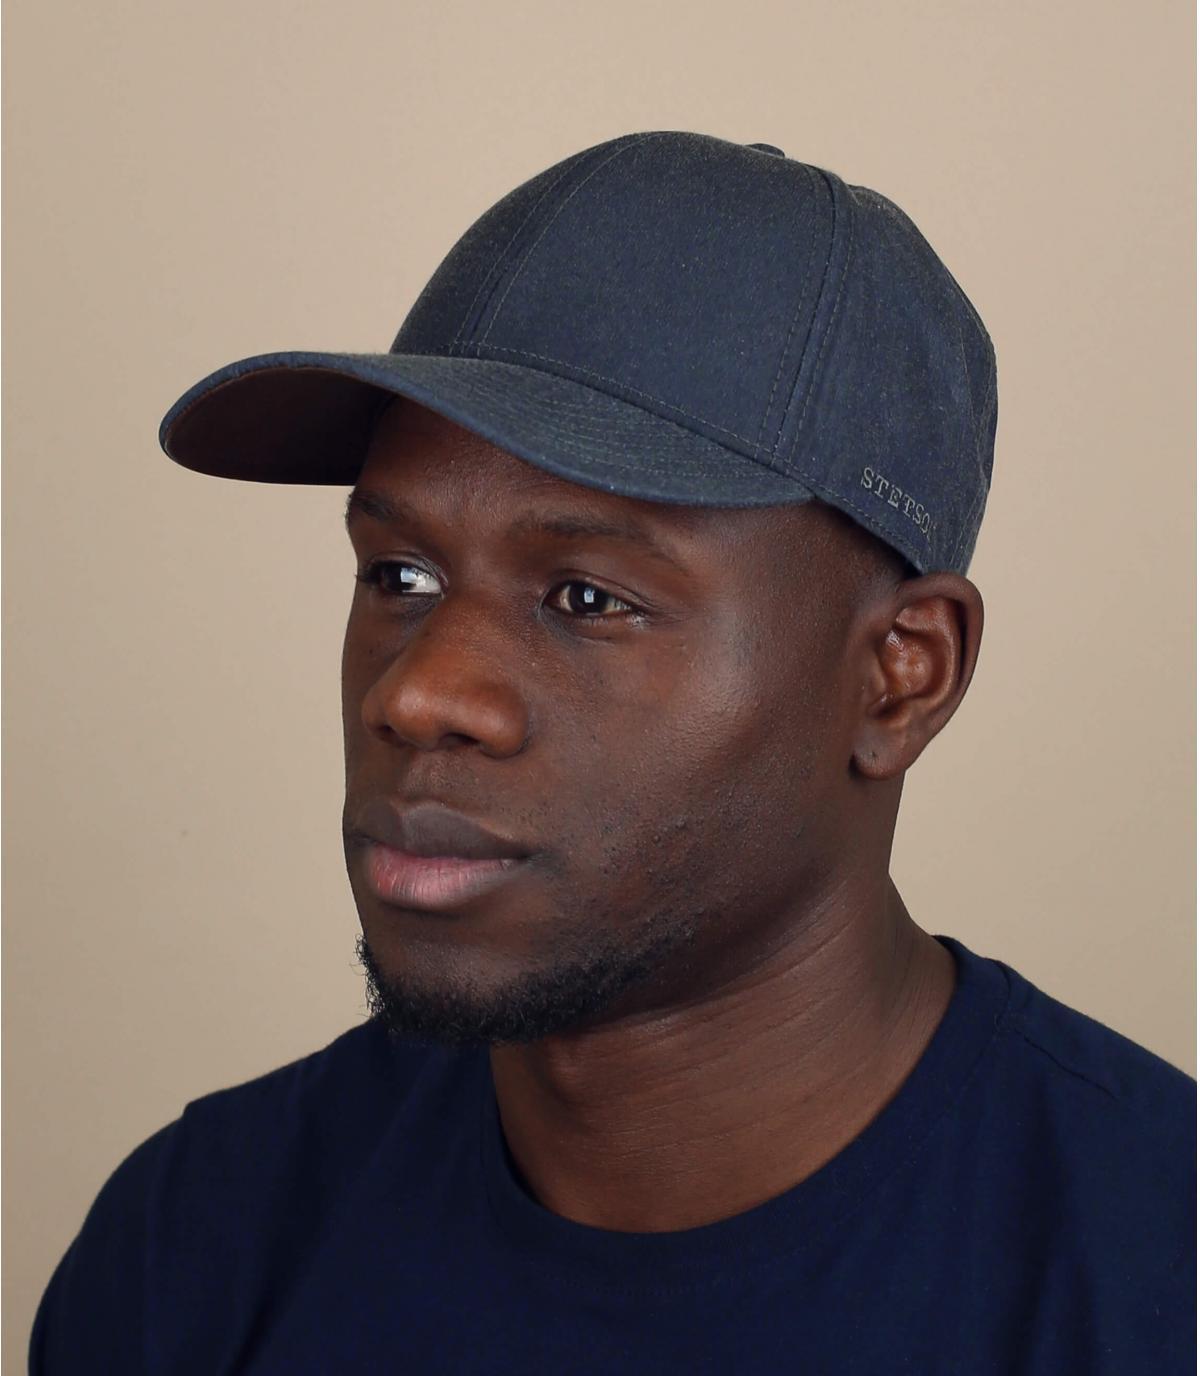 Cappellino idrorepellente grigio